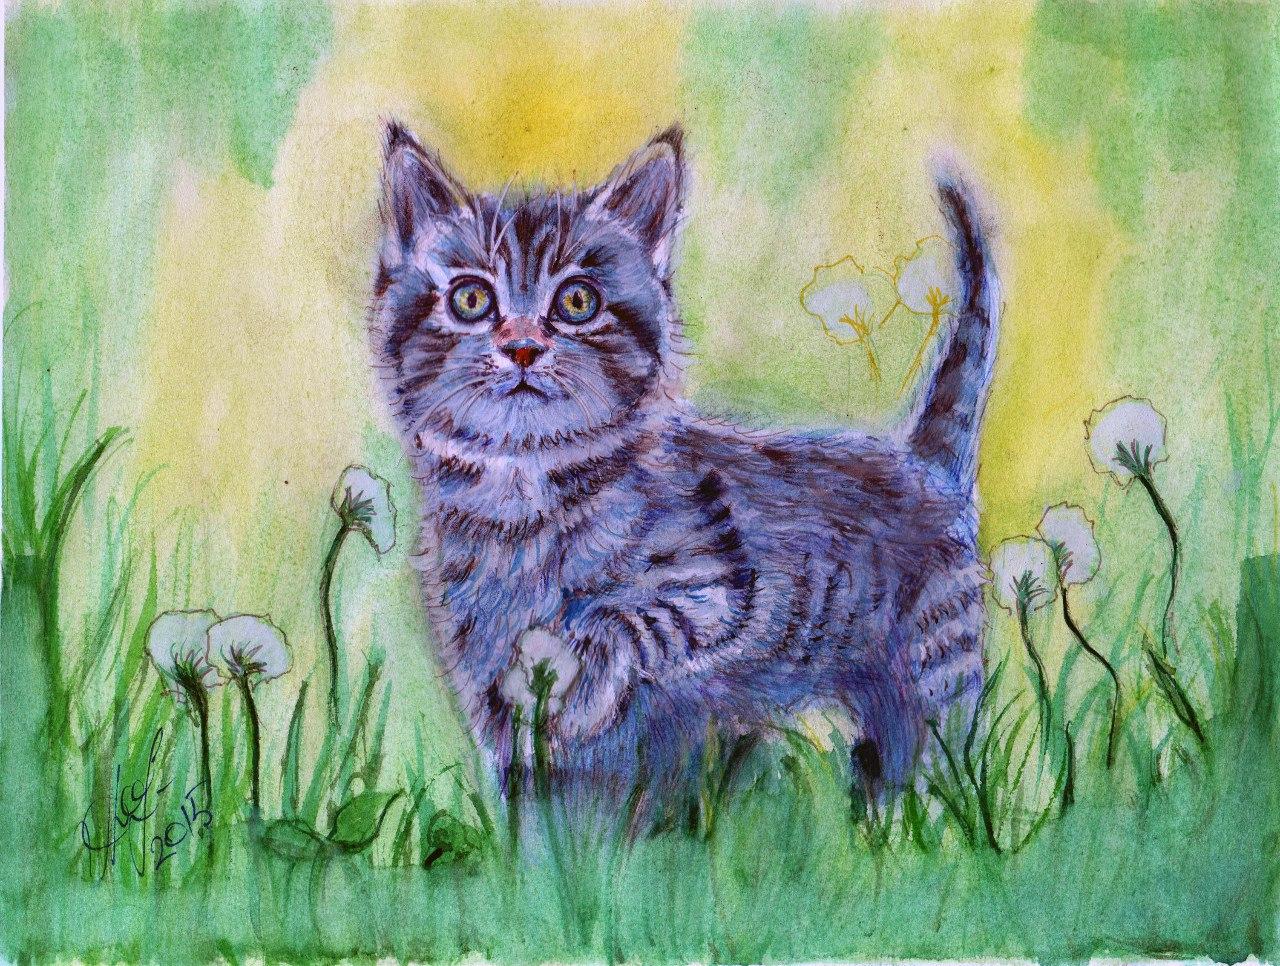 Нарисованная картинка котенка